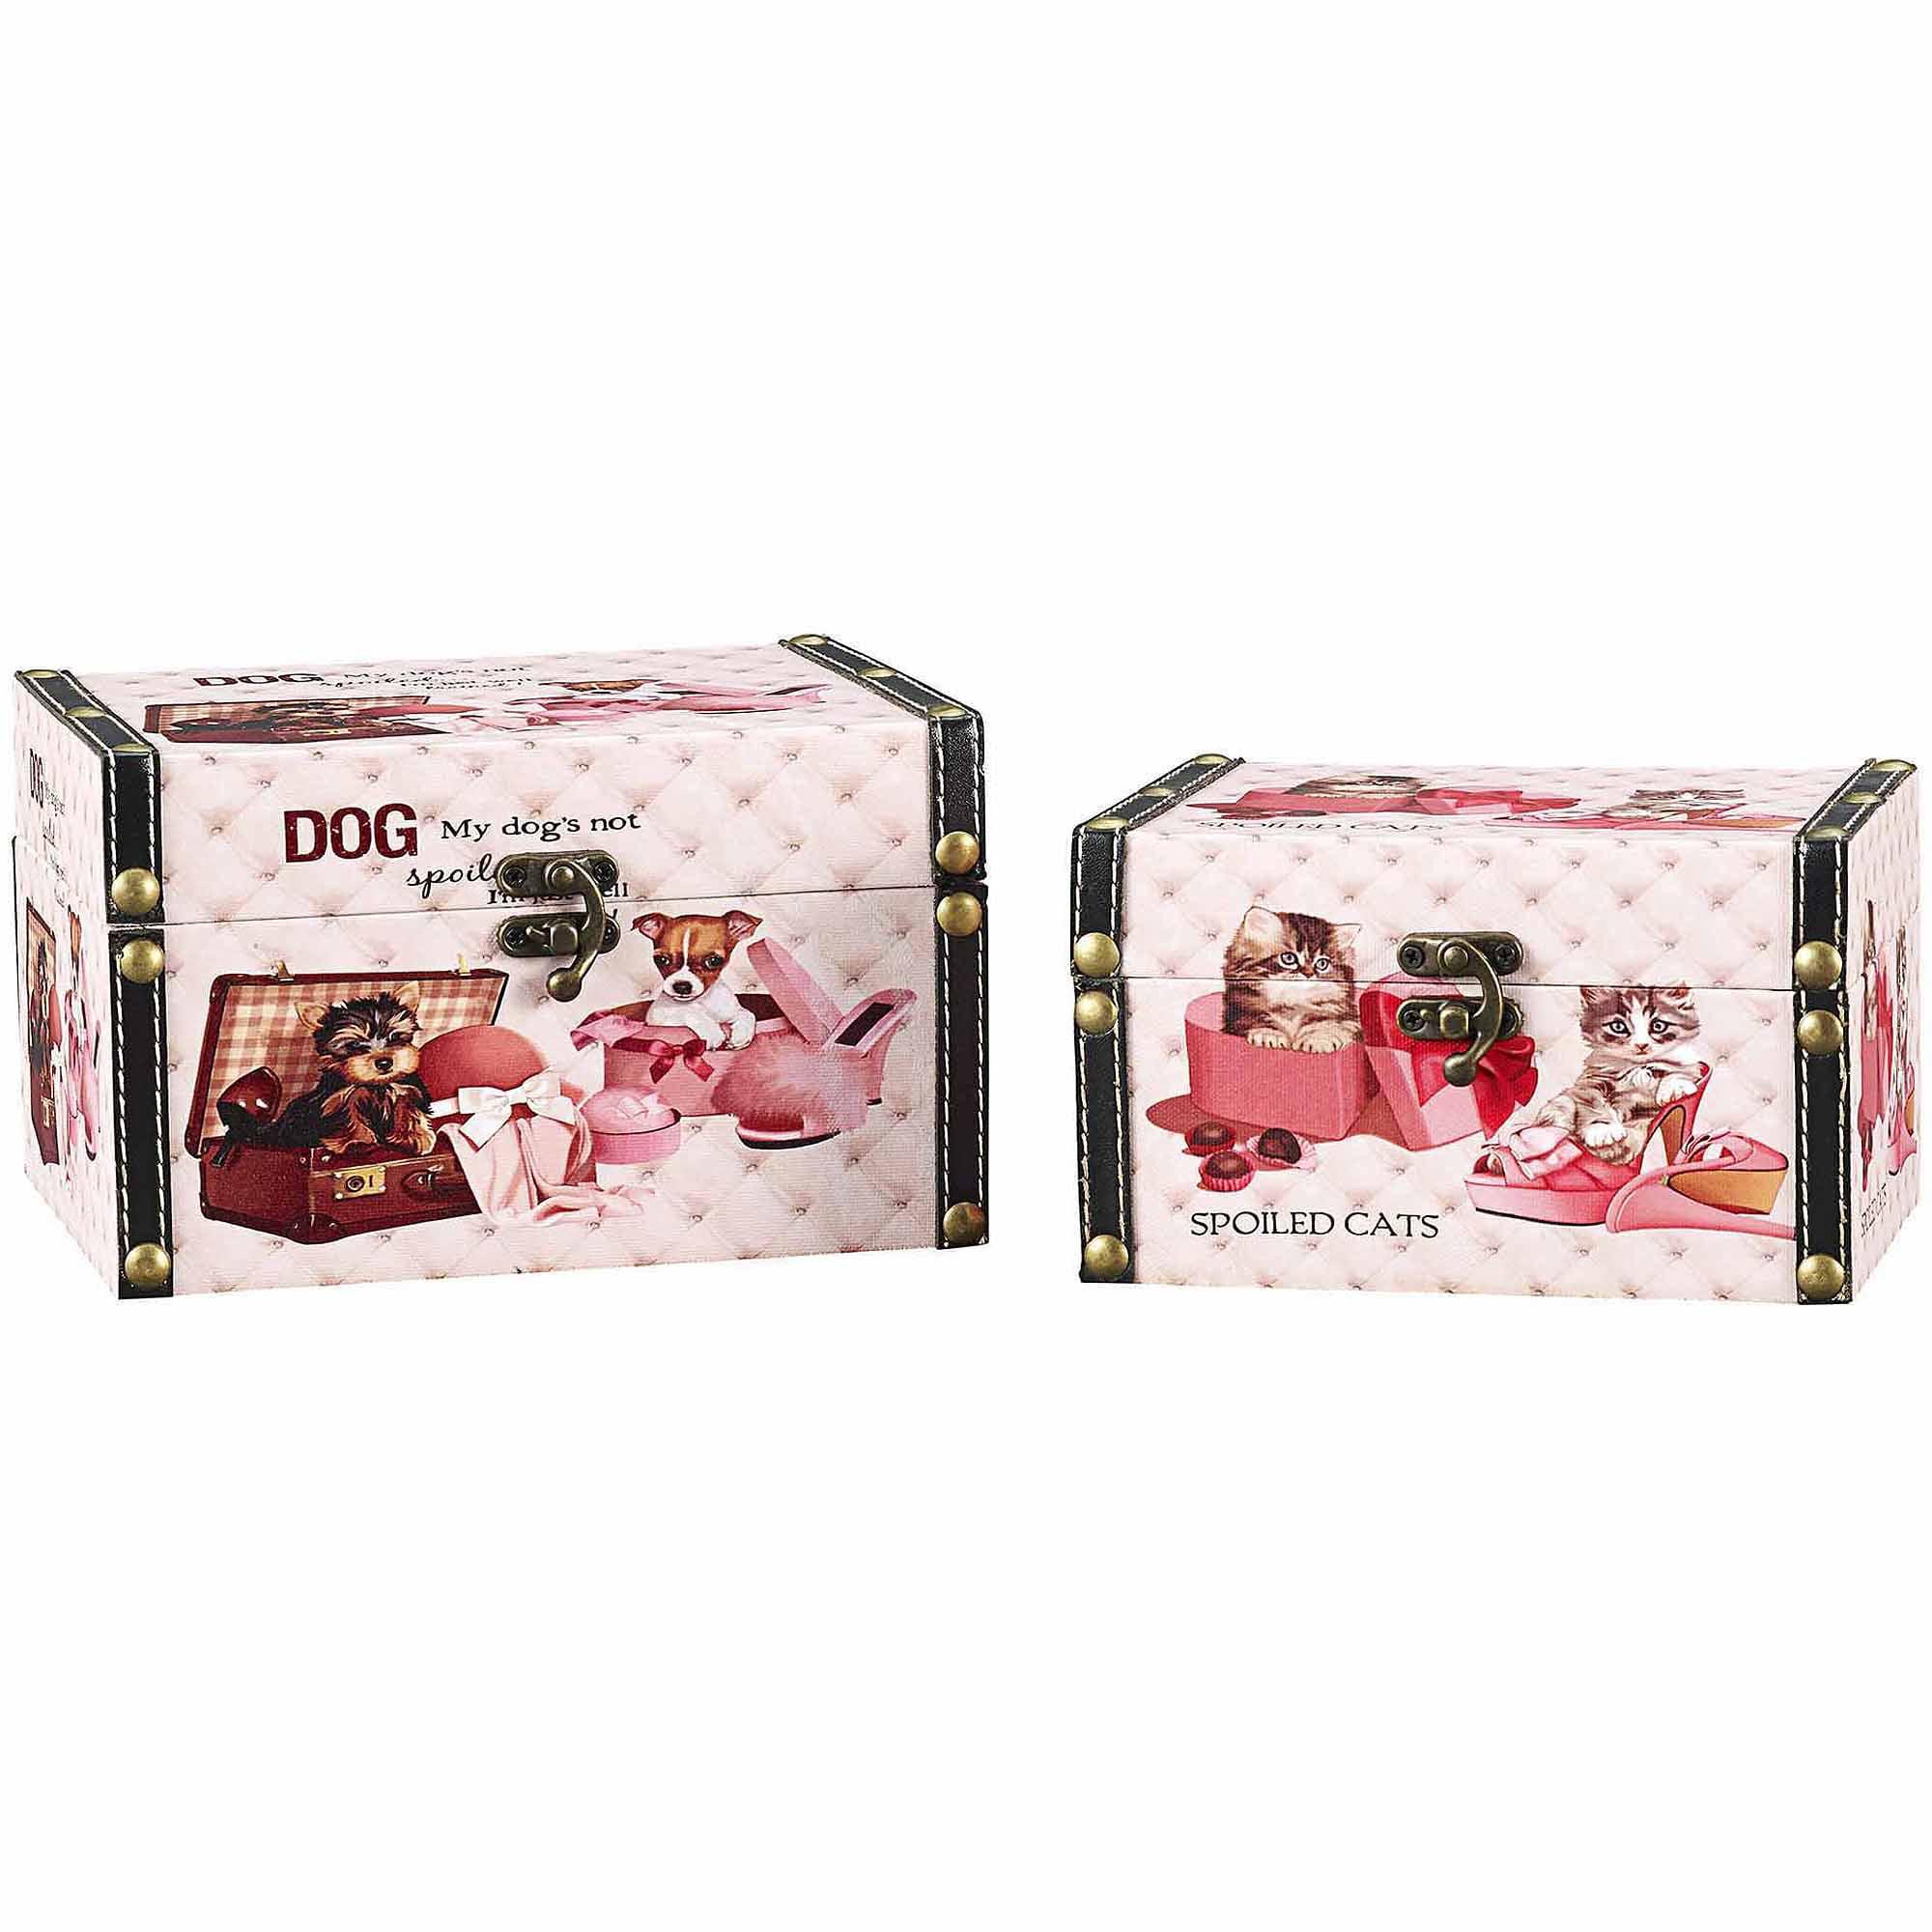 Household Essentials Decorative Storage Box, Cat and Dog Design, Set of 2